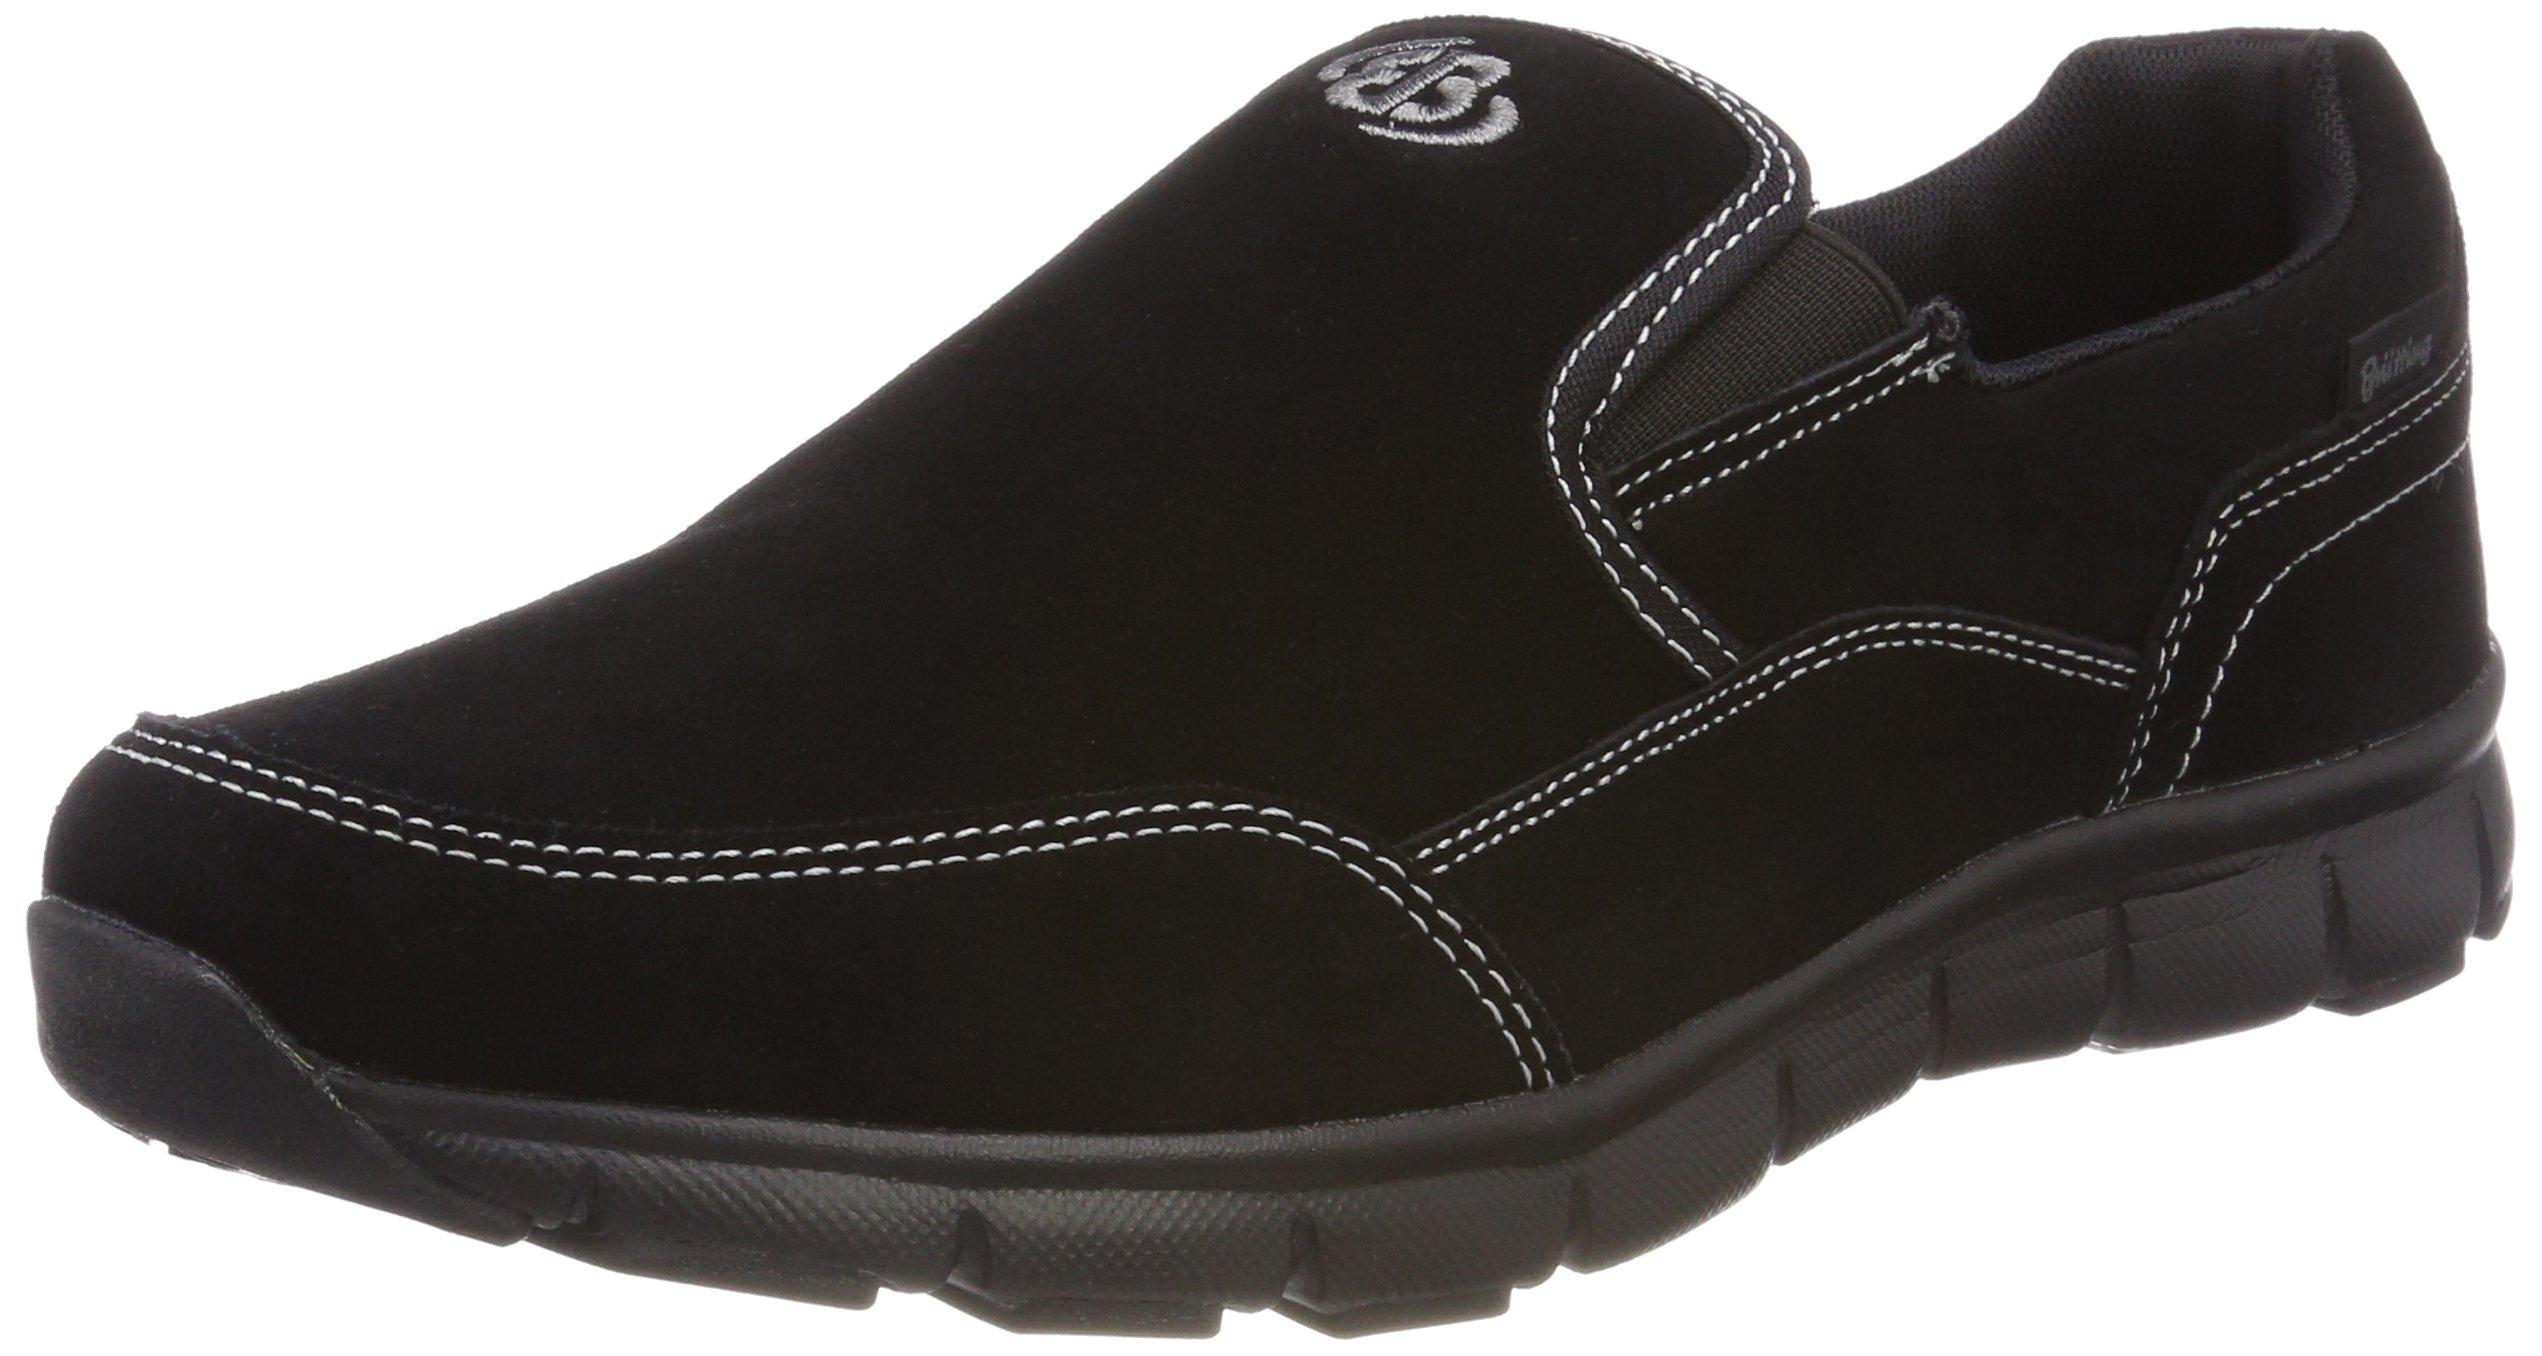 Basses CiboloSneakers HommeNoir Bruetting Eu Brütting Schwarz45 SMUpzV